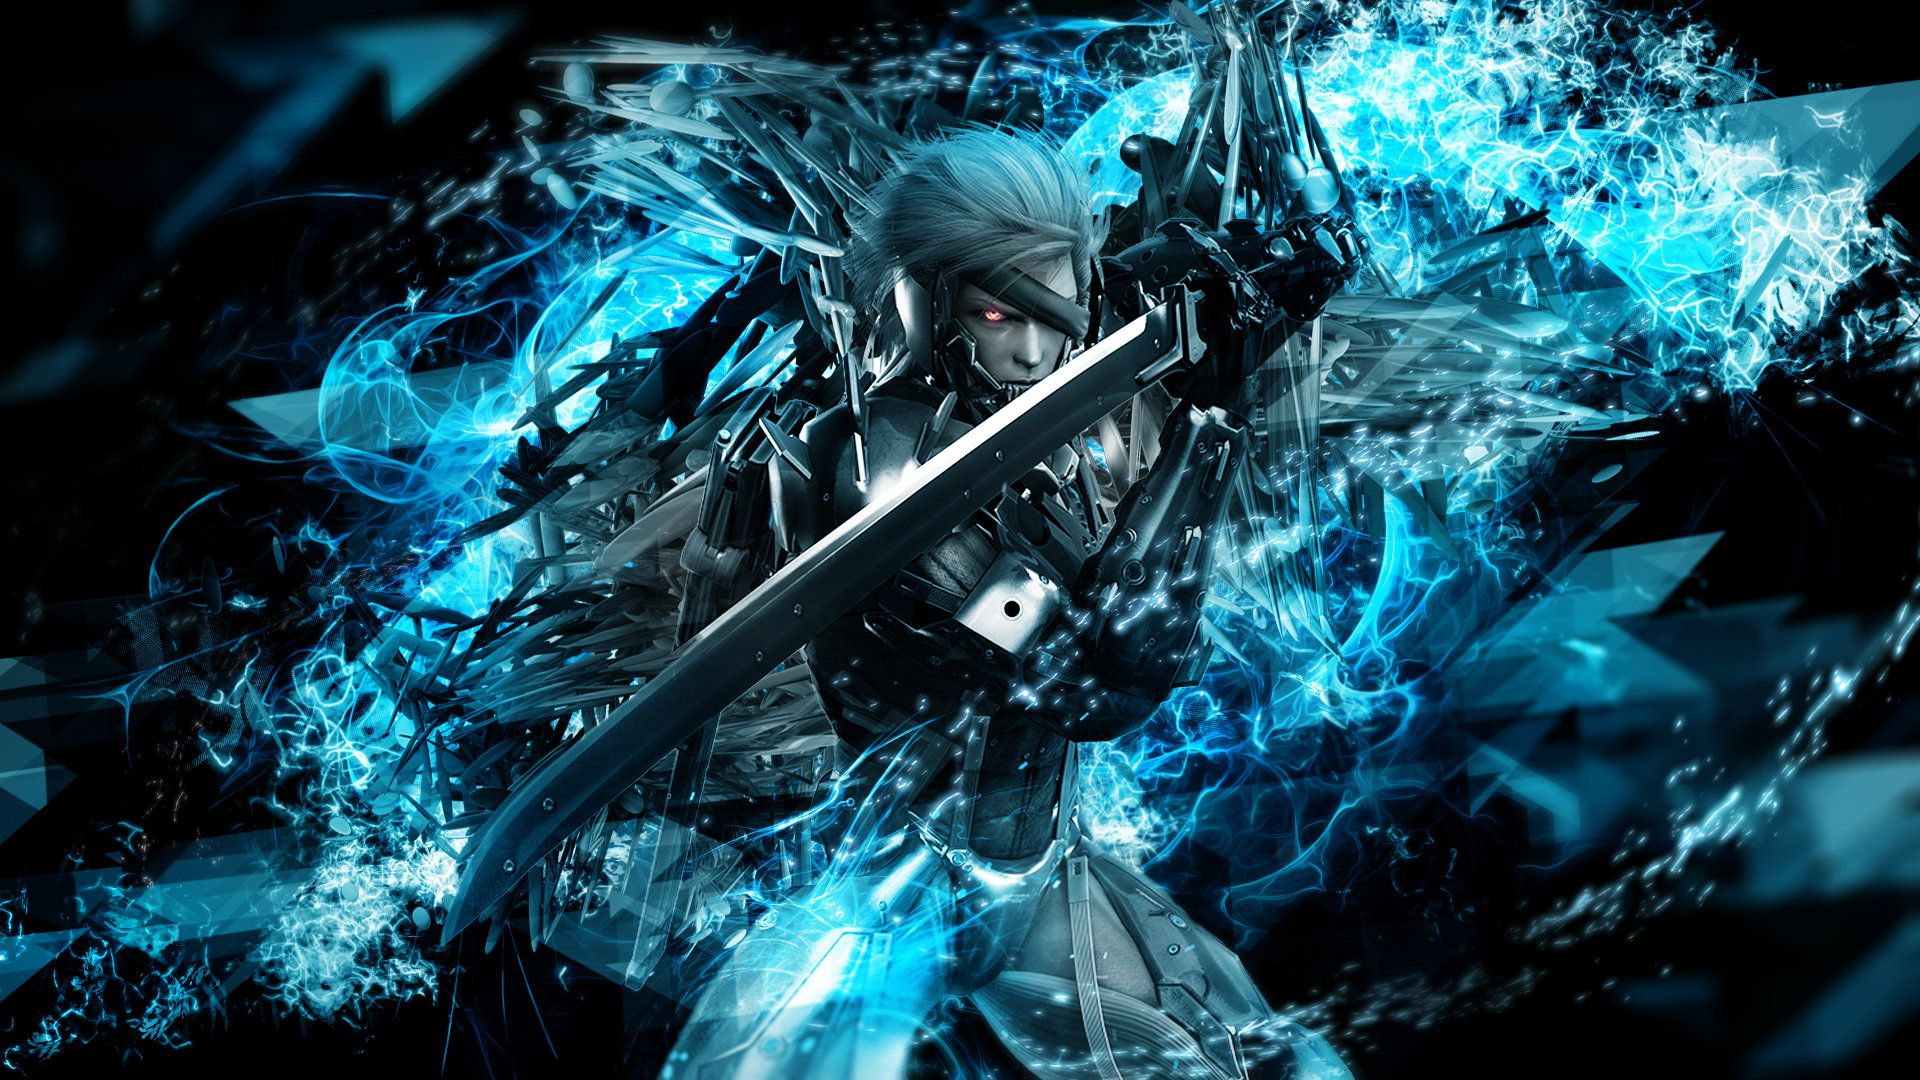 WallpapersWide.com | Metal Gear HD Desktop Wallpapers for ...